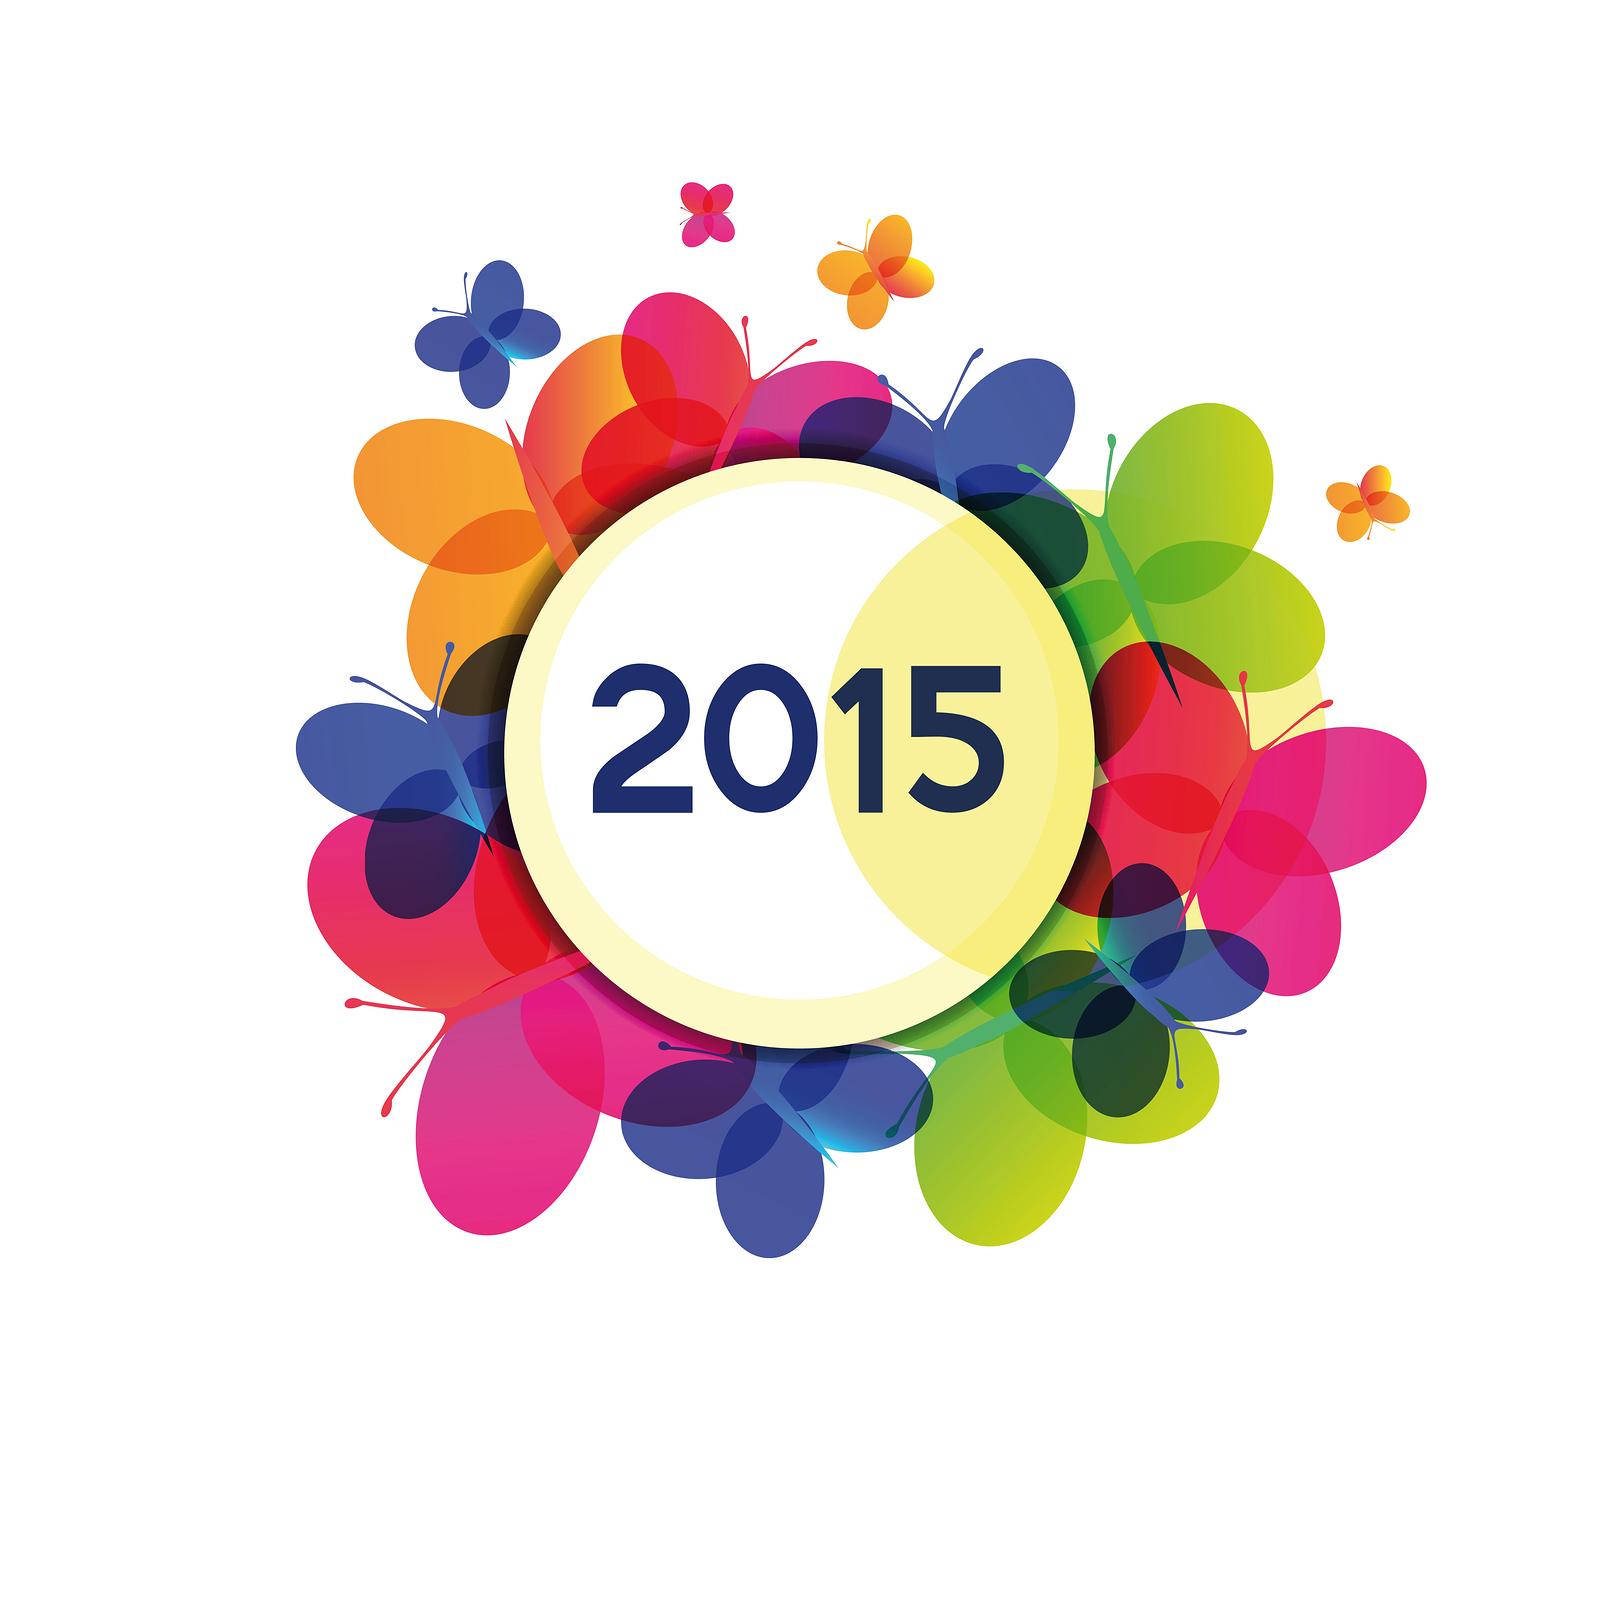 Happy-New-Year-pics-full-HD-wallpaper-wp3606554